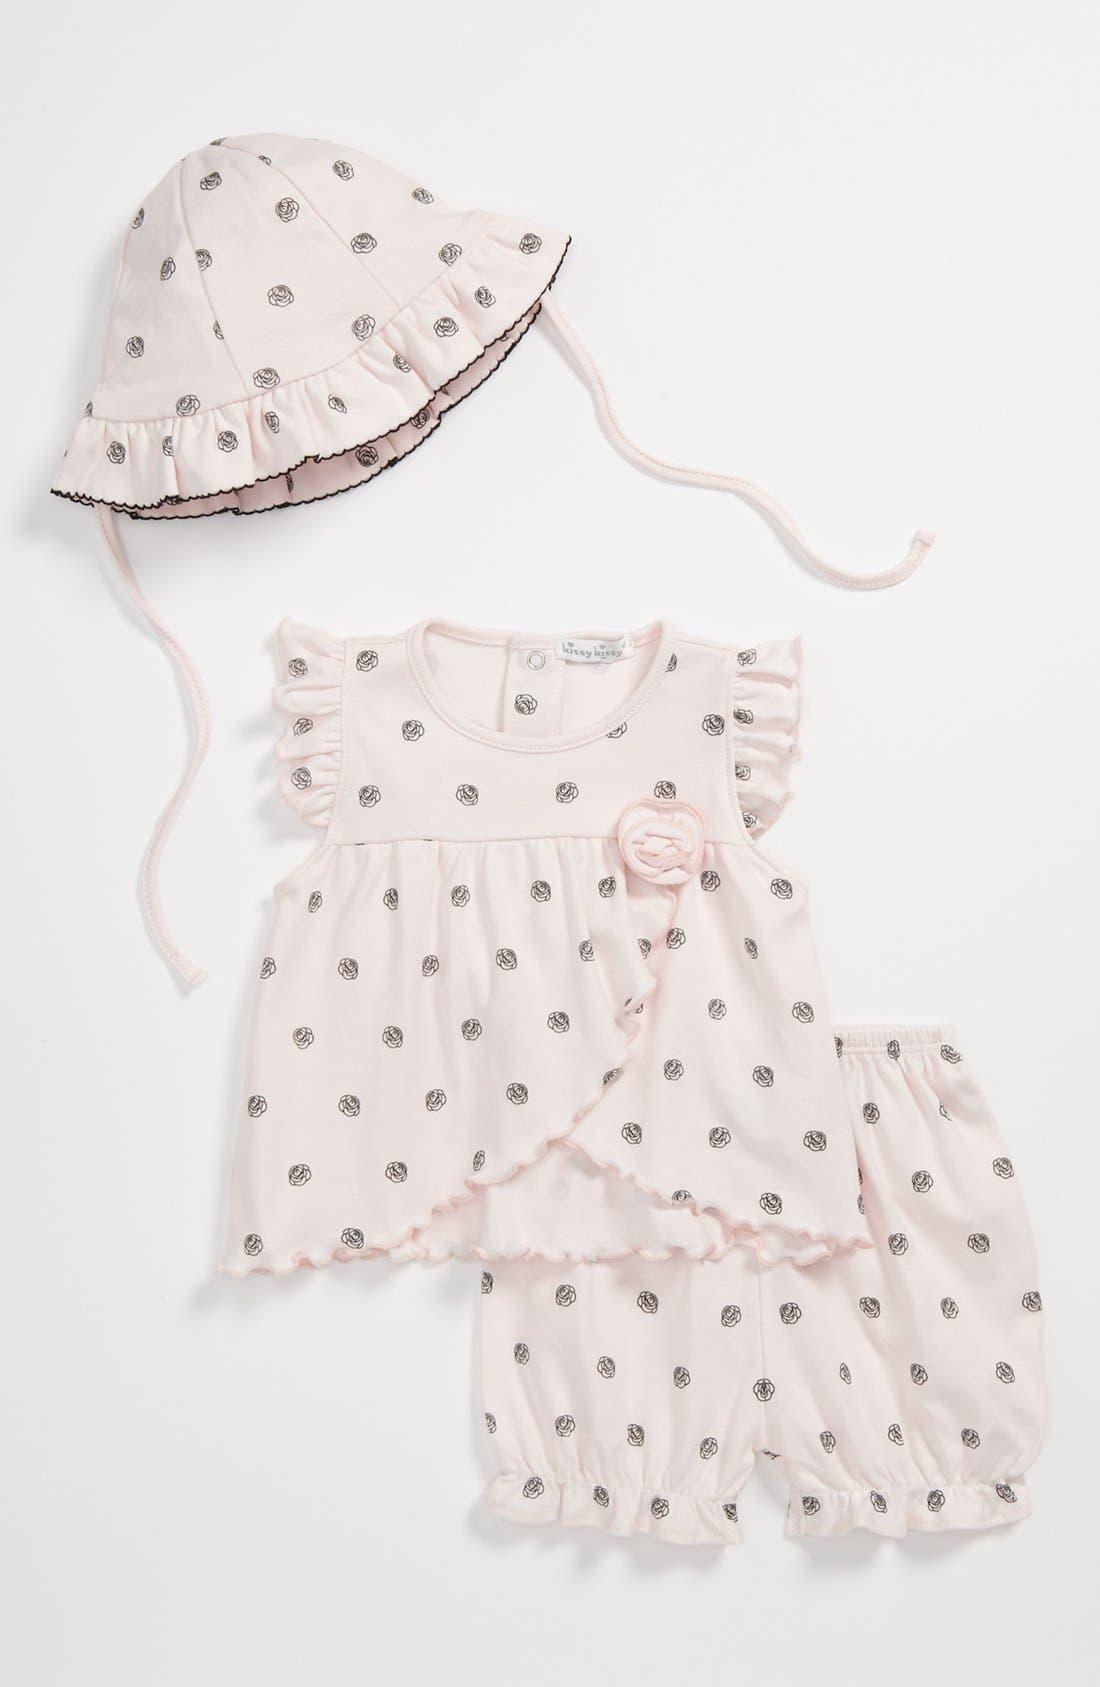 Main Image - Kissy Kissy 'Charisma' Top, Pants & Hat (Baby)